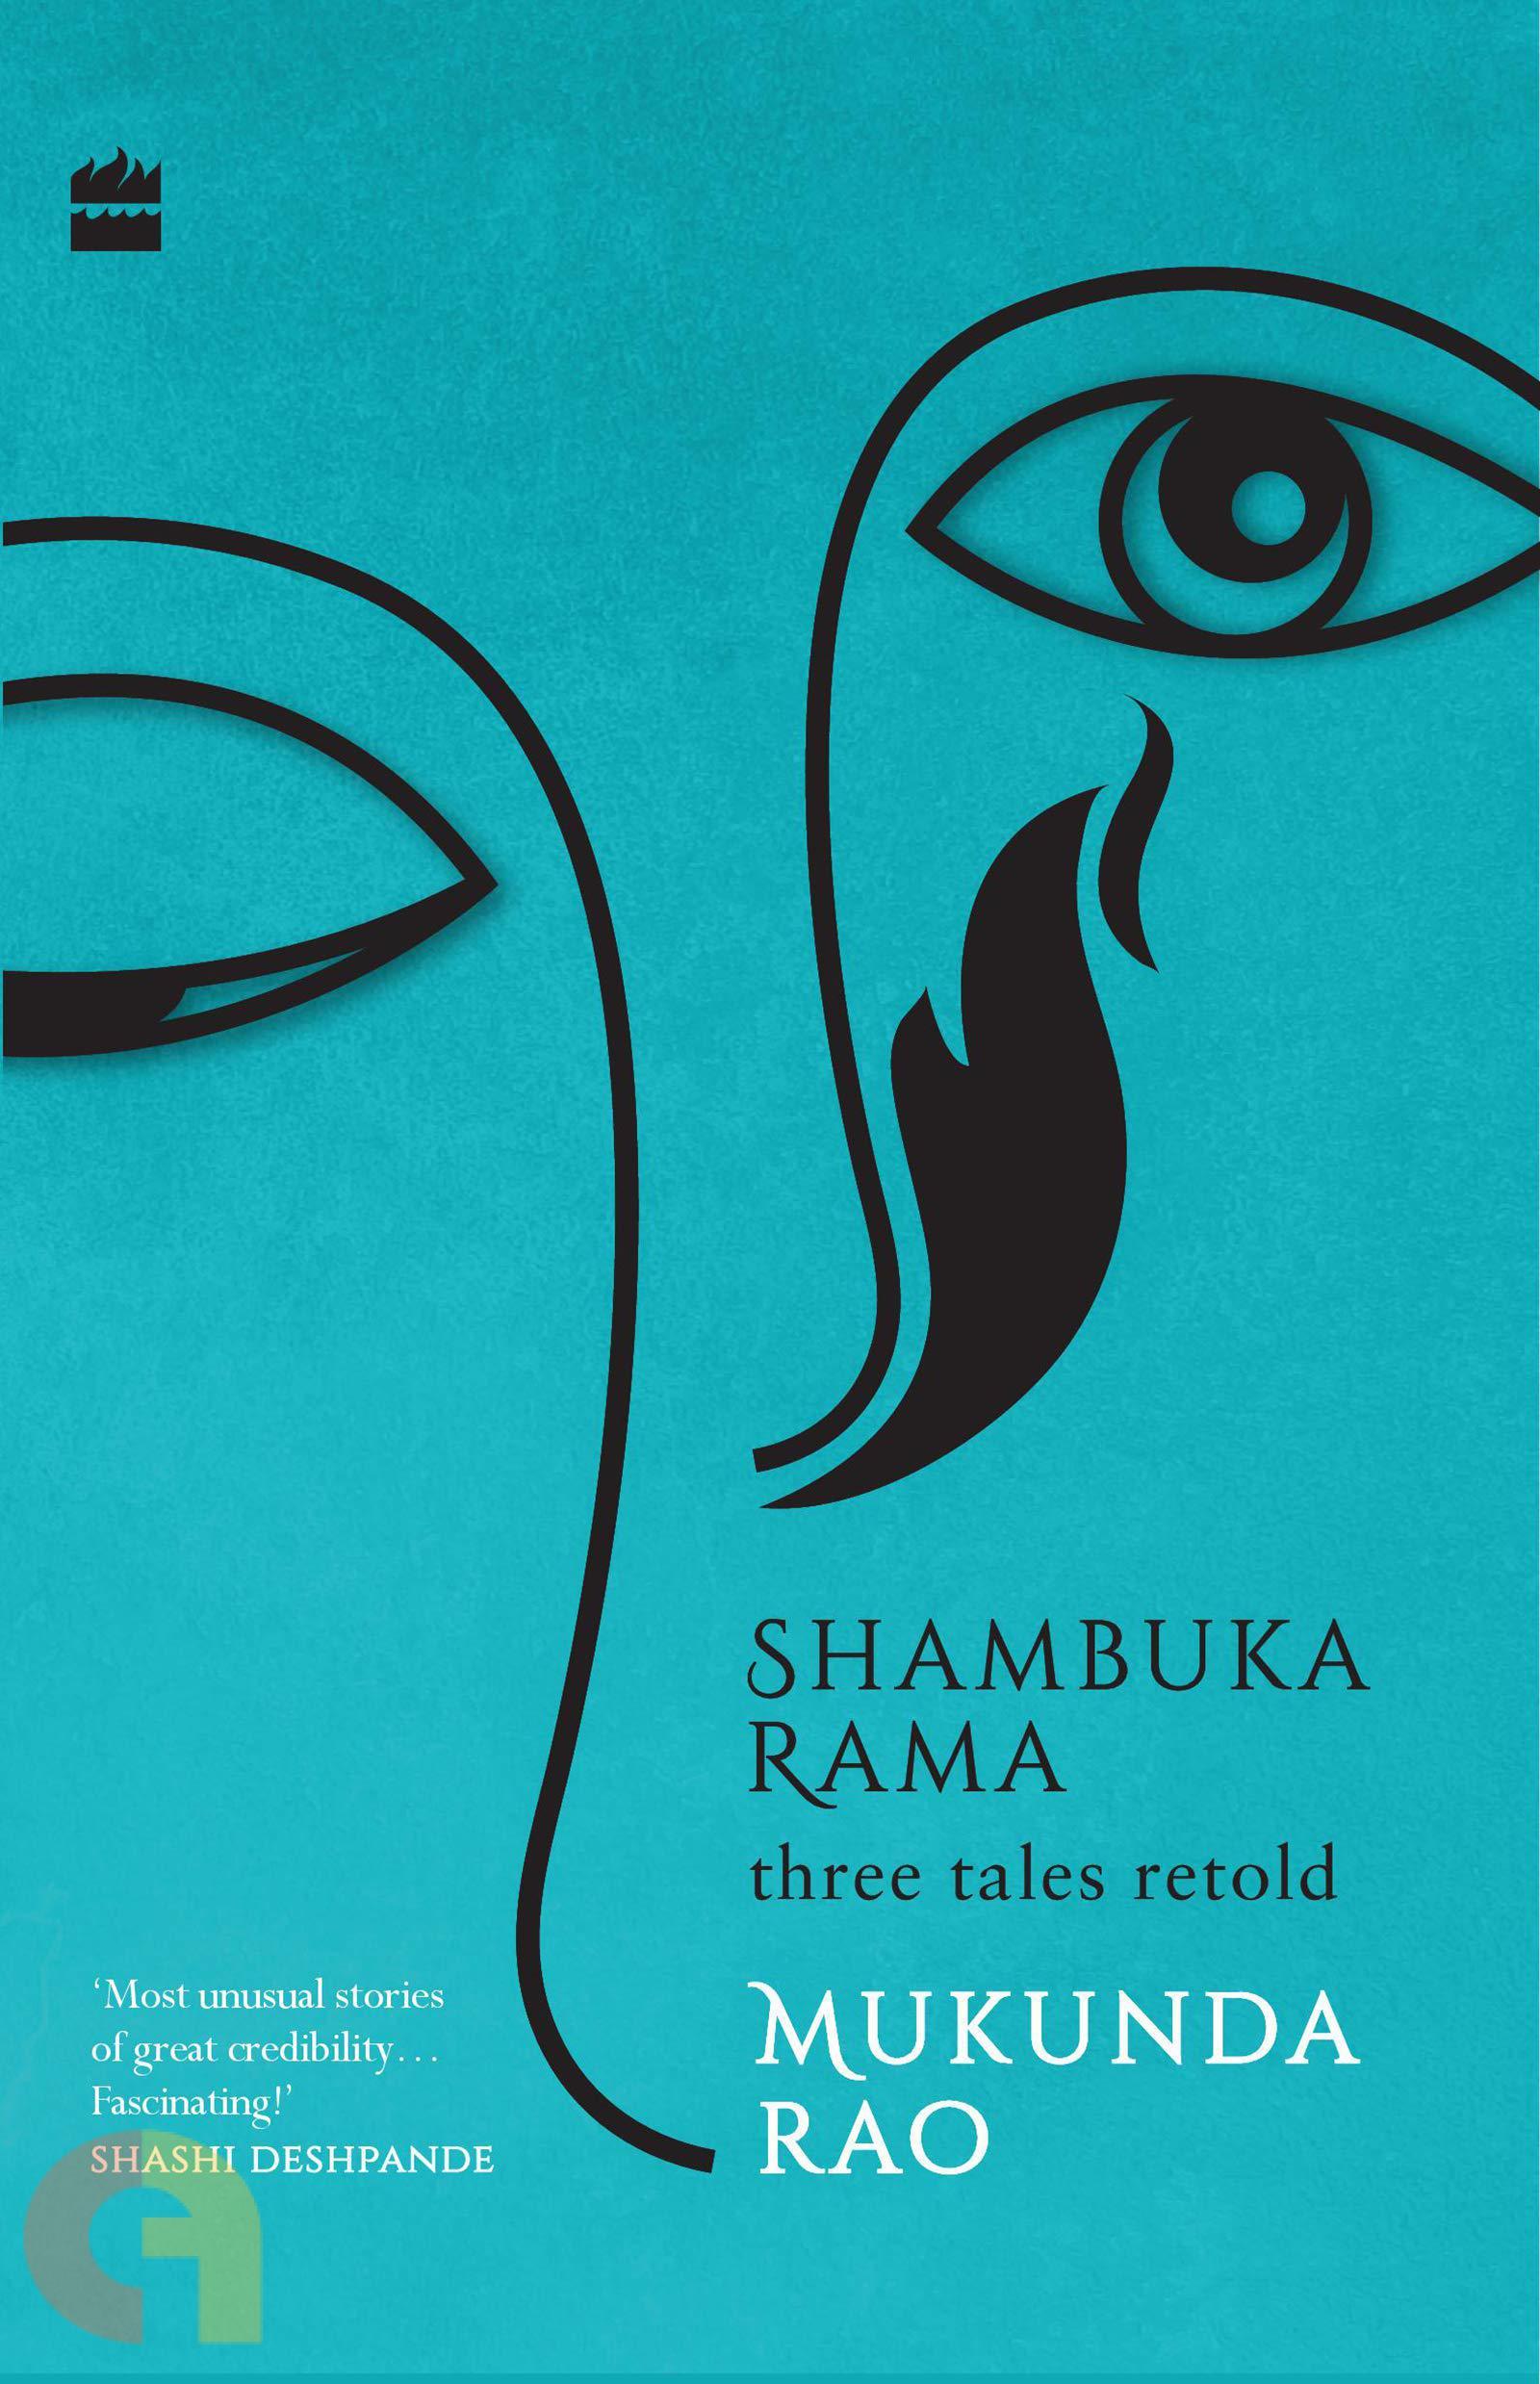 SHAMBUKA RAMA THREE TALES RETOLD